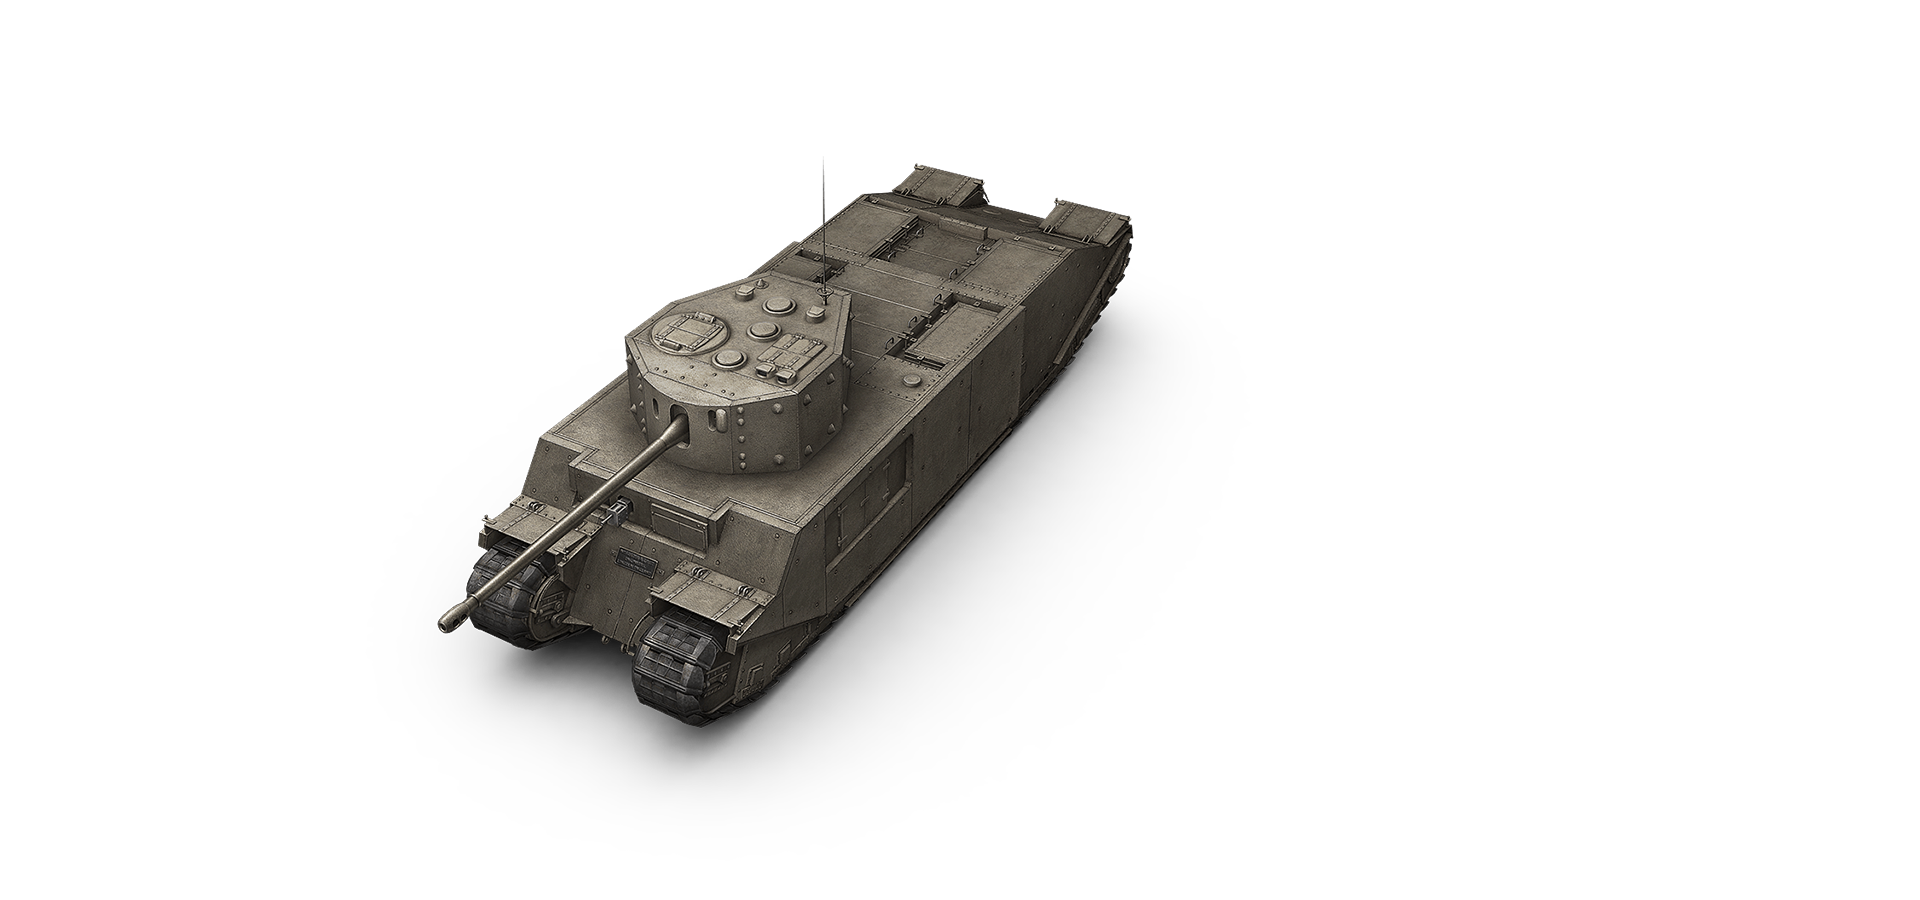 тог 2 в world of tanks